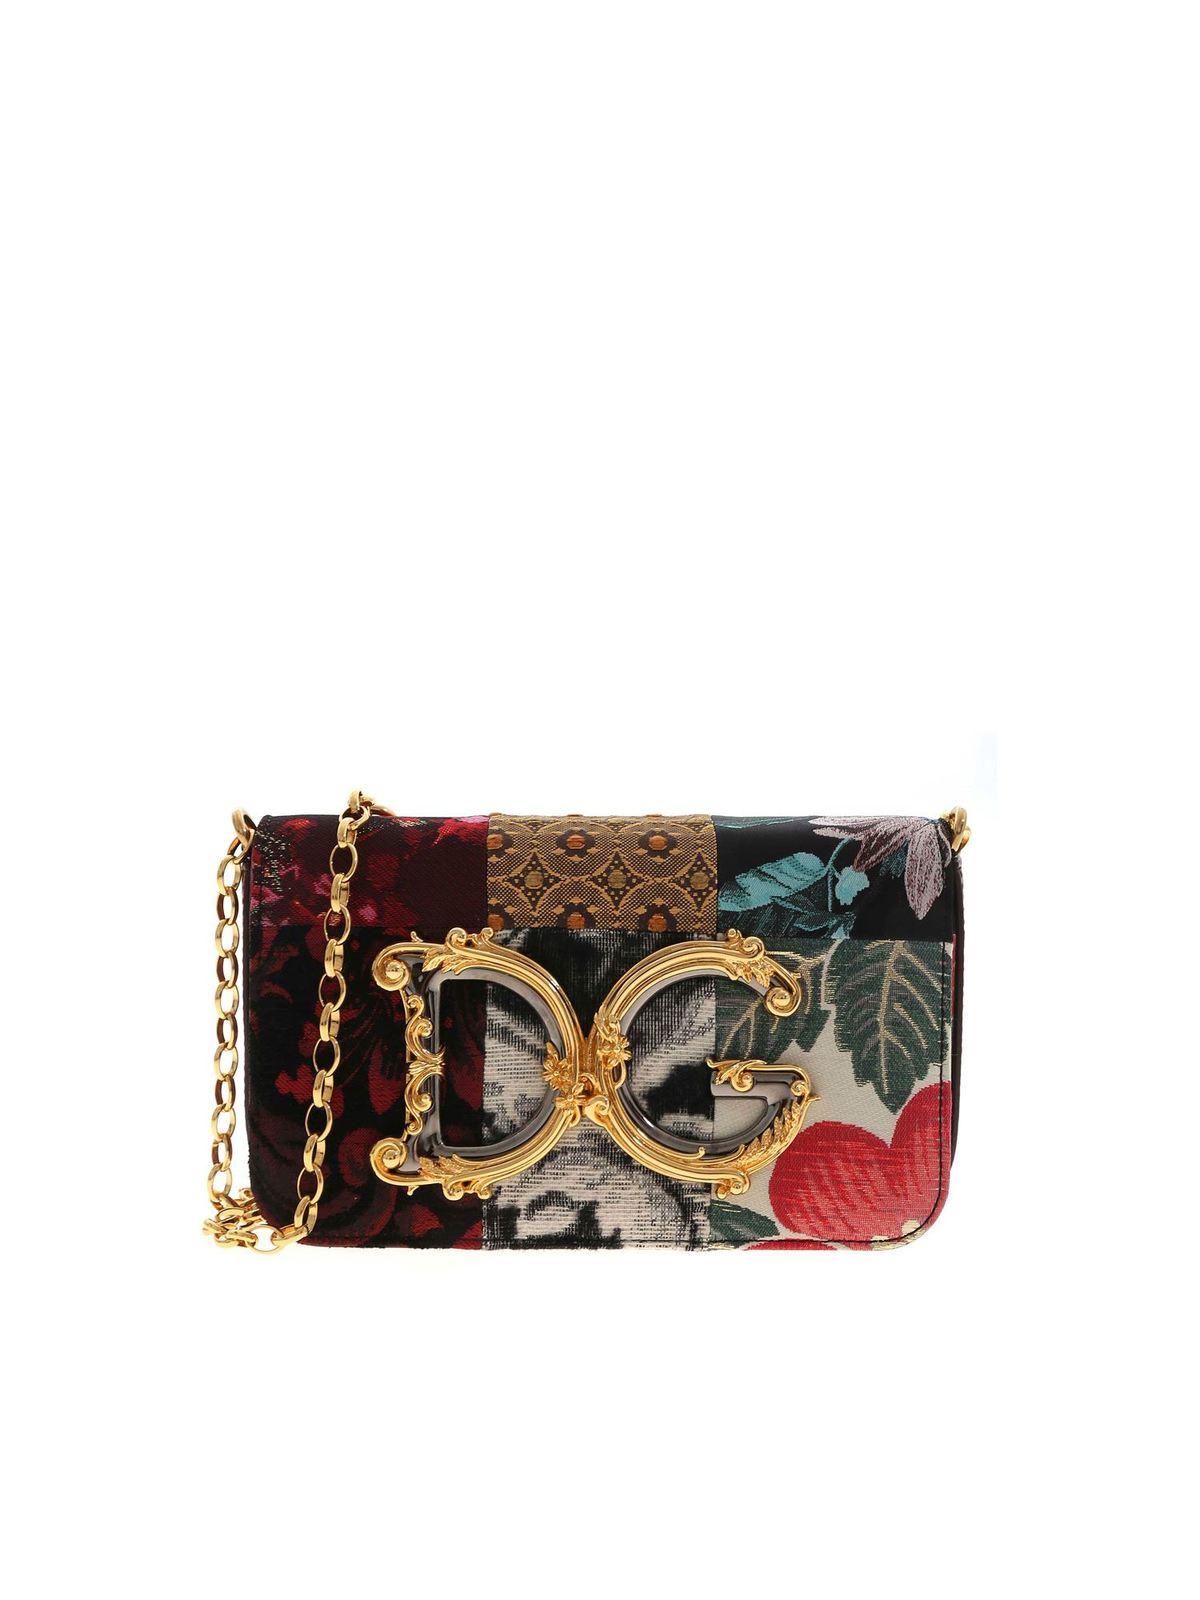 Dolce & Gabbana DG GIRLS MULTICOLOR CROSSBODY BAG